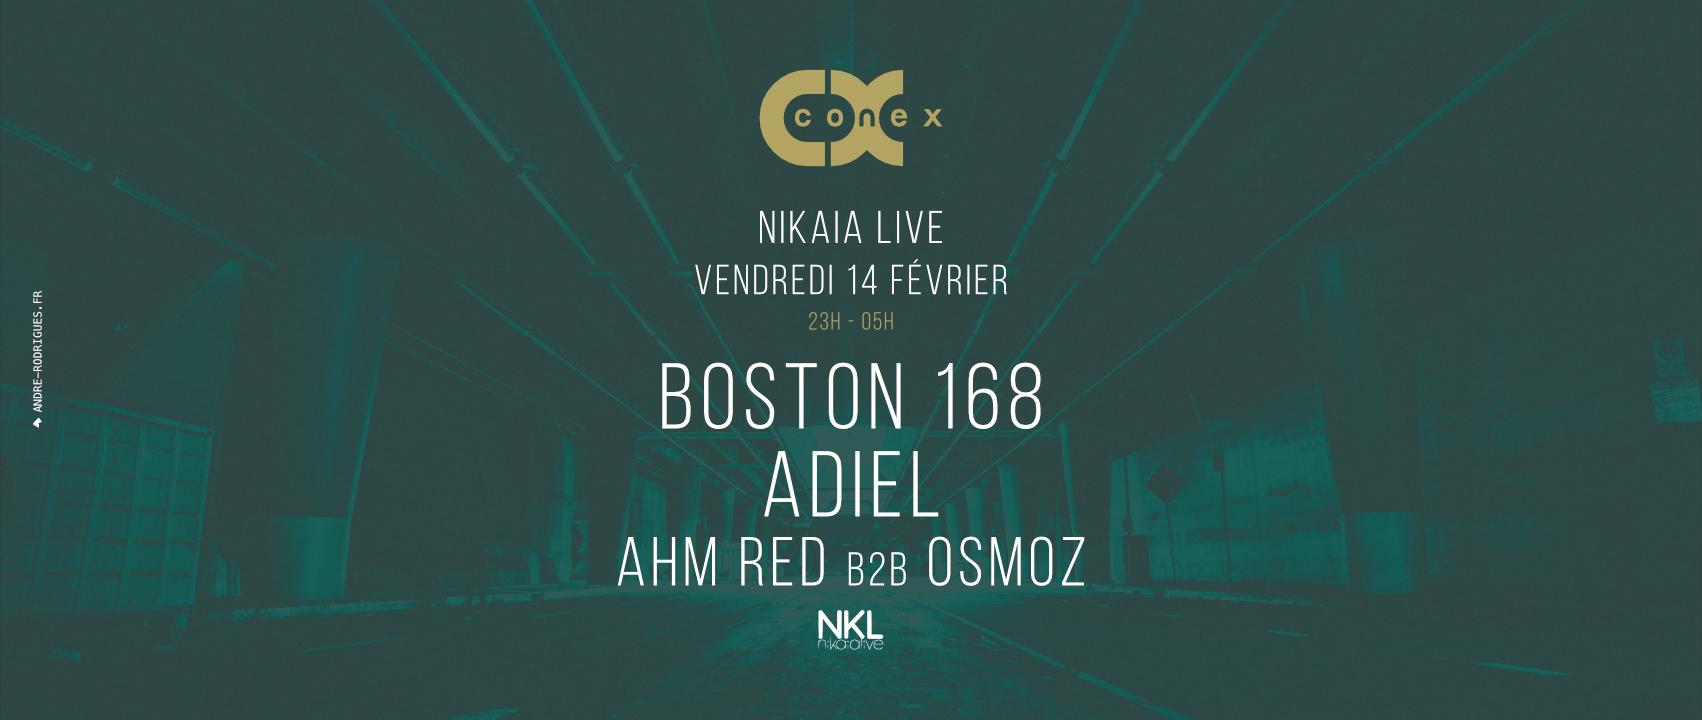 Conex :: Boston 168, Adiel, Ahm Red, Osmoz at Nikaia Live